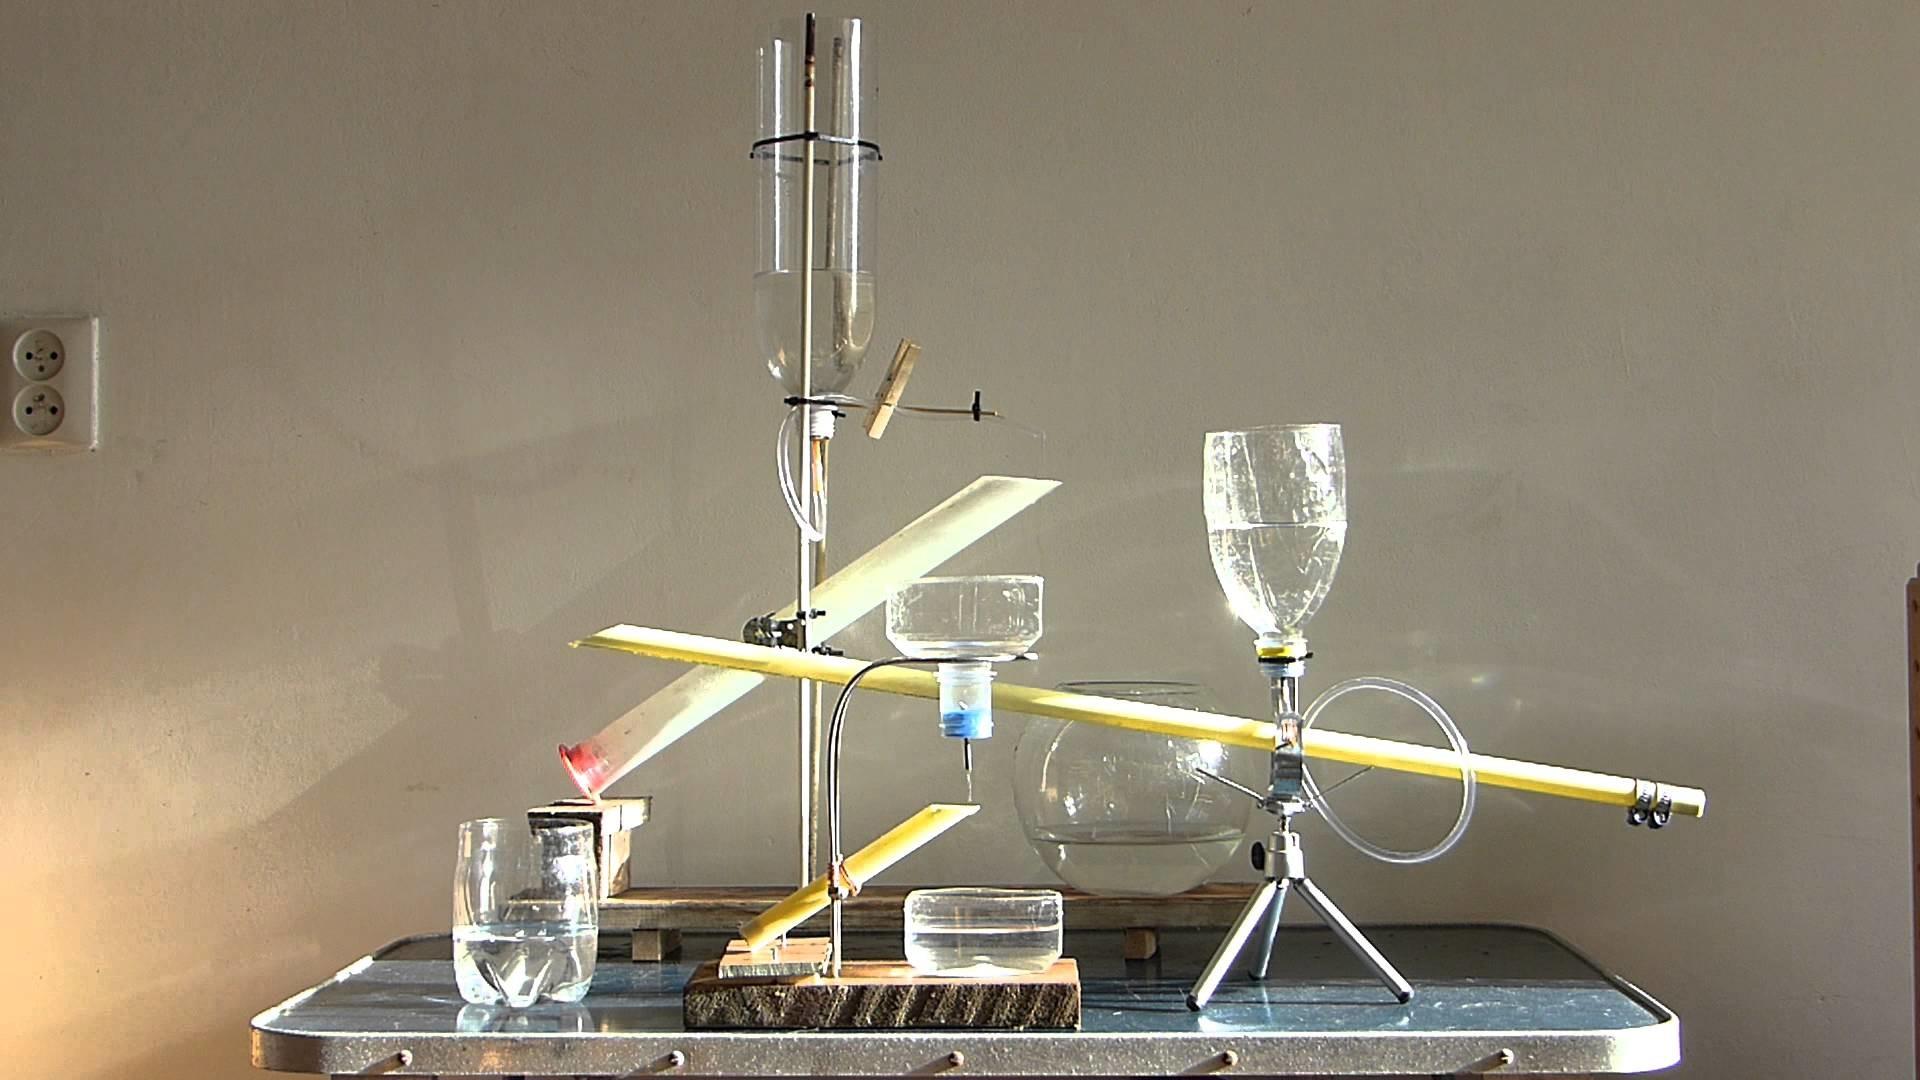 D.I.Y. Shishi Odoshi water objects